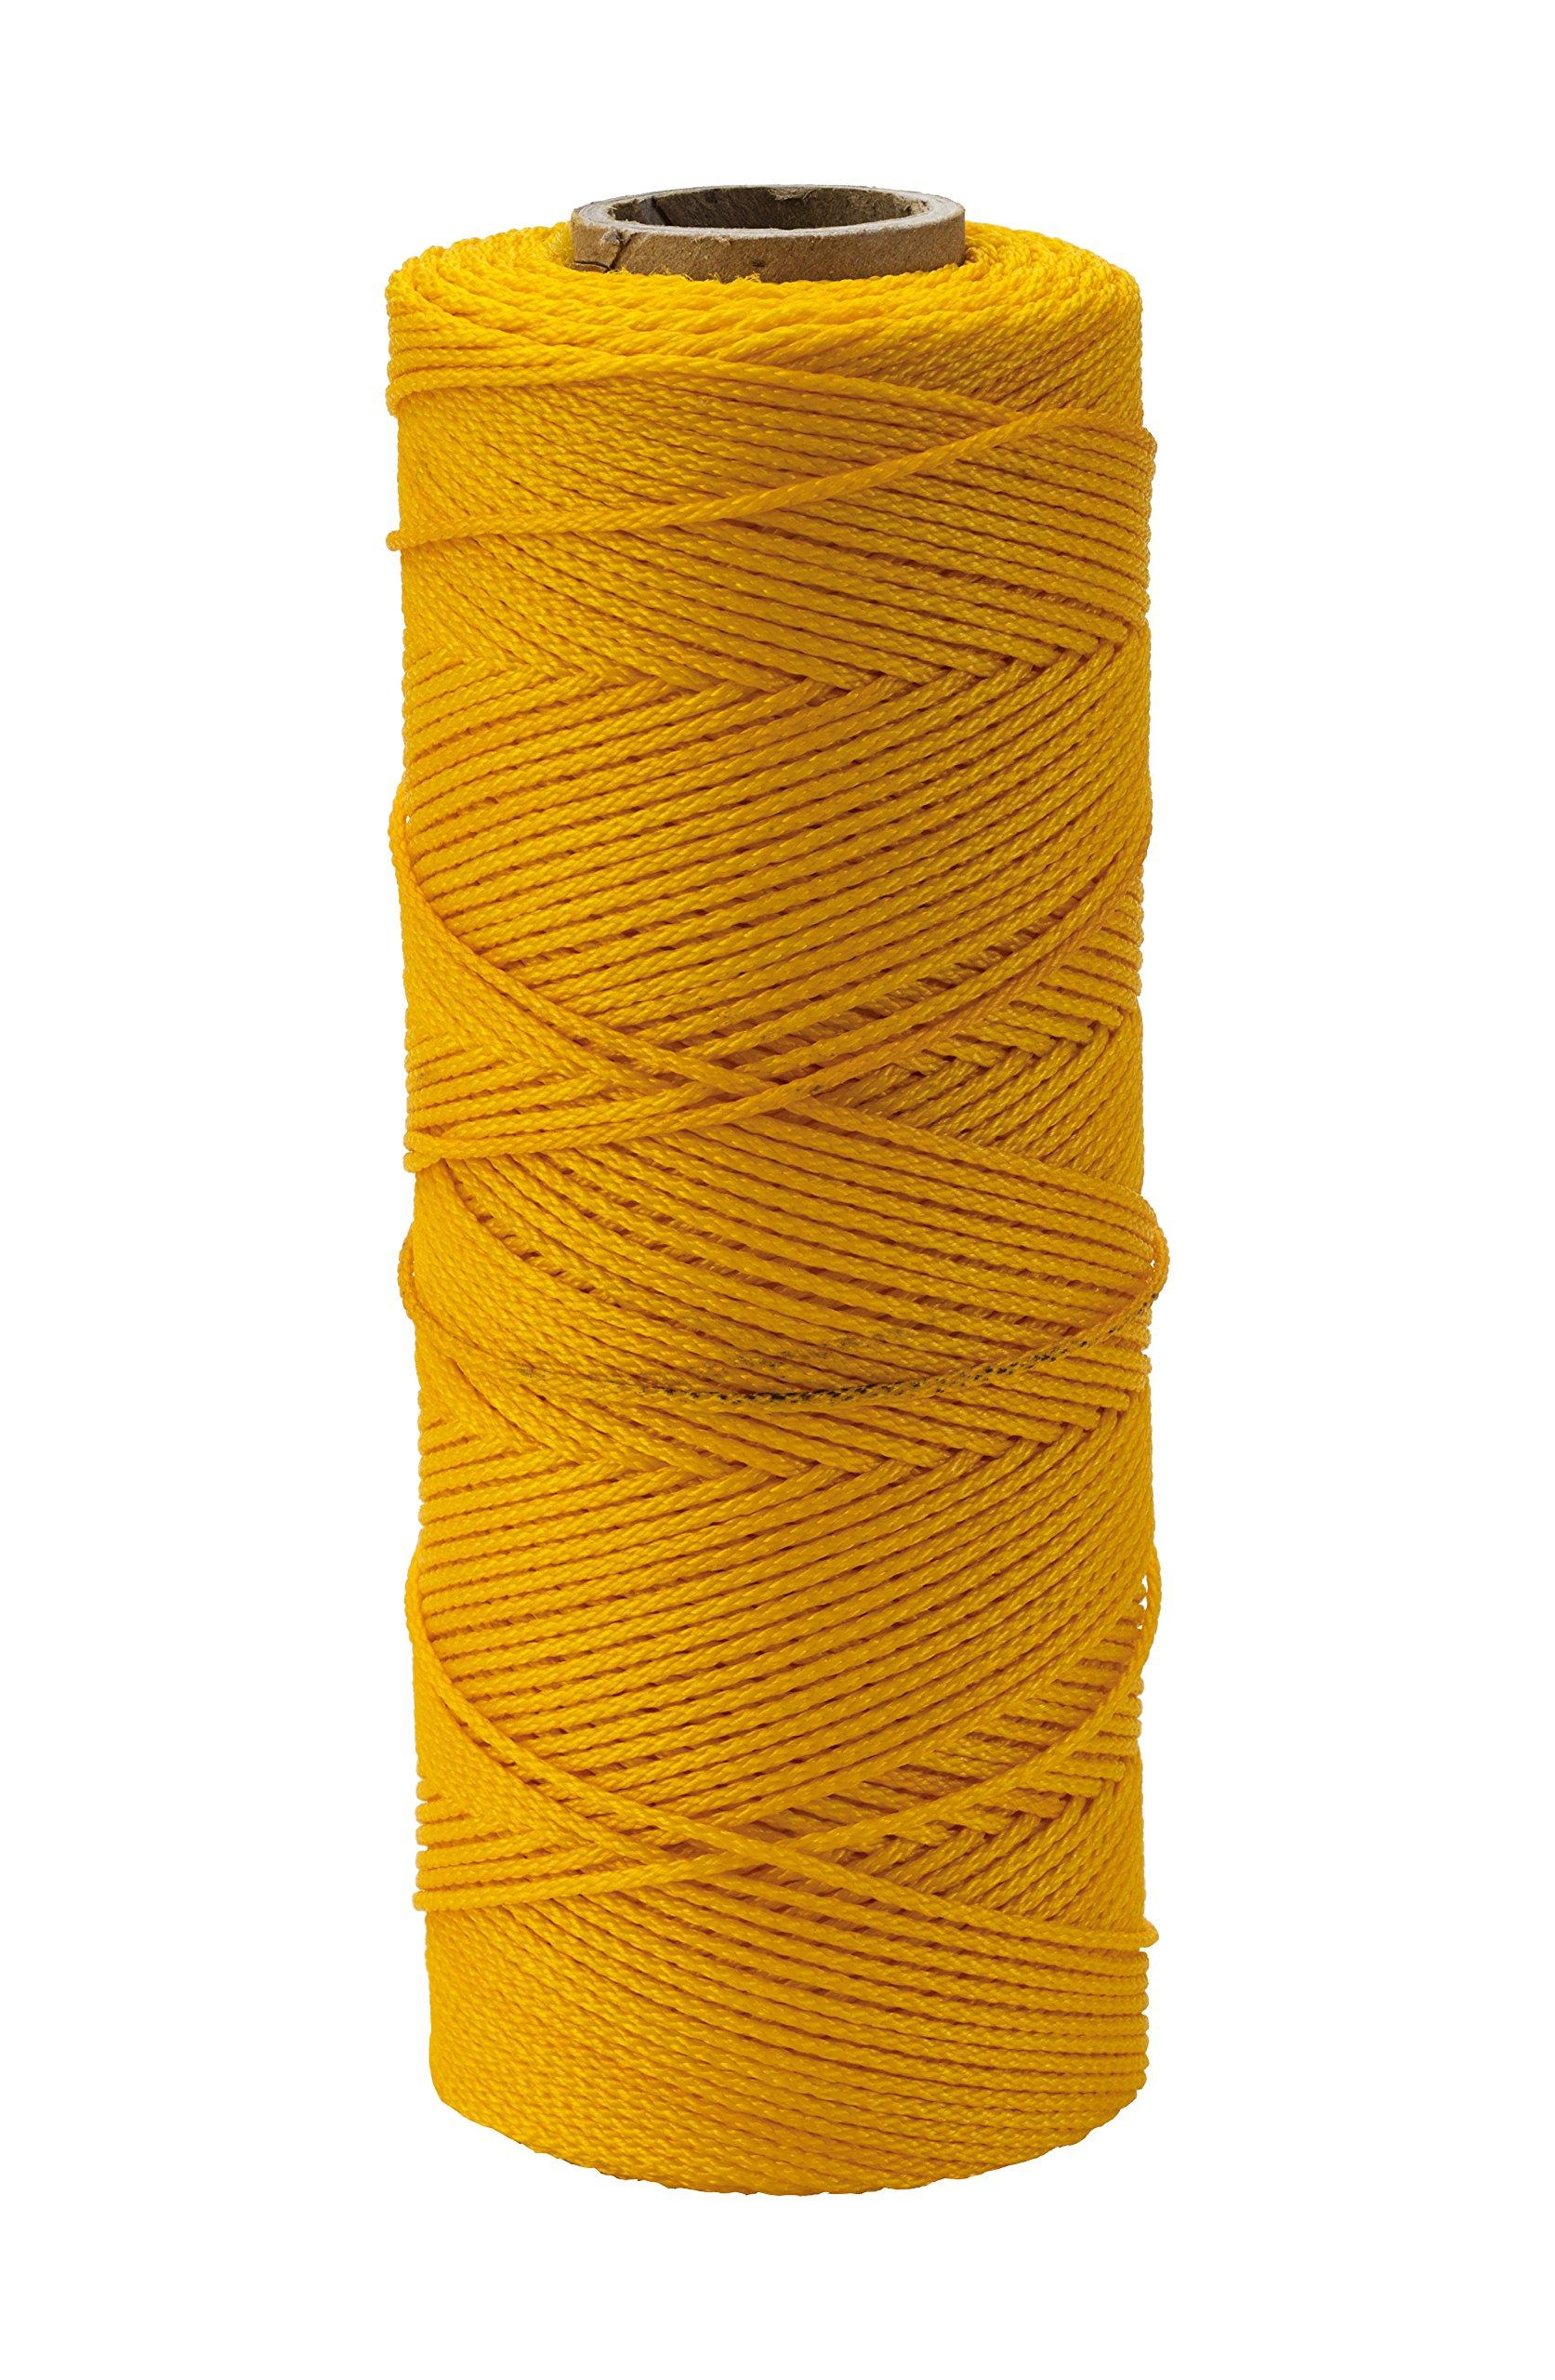 Mutual Industries 14661-41-550 Nylon Mason Twine, 1/2 lb. Twisted, 18 x 550', Yellow (Pack of 6)